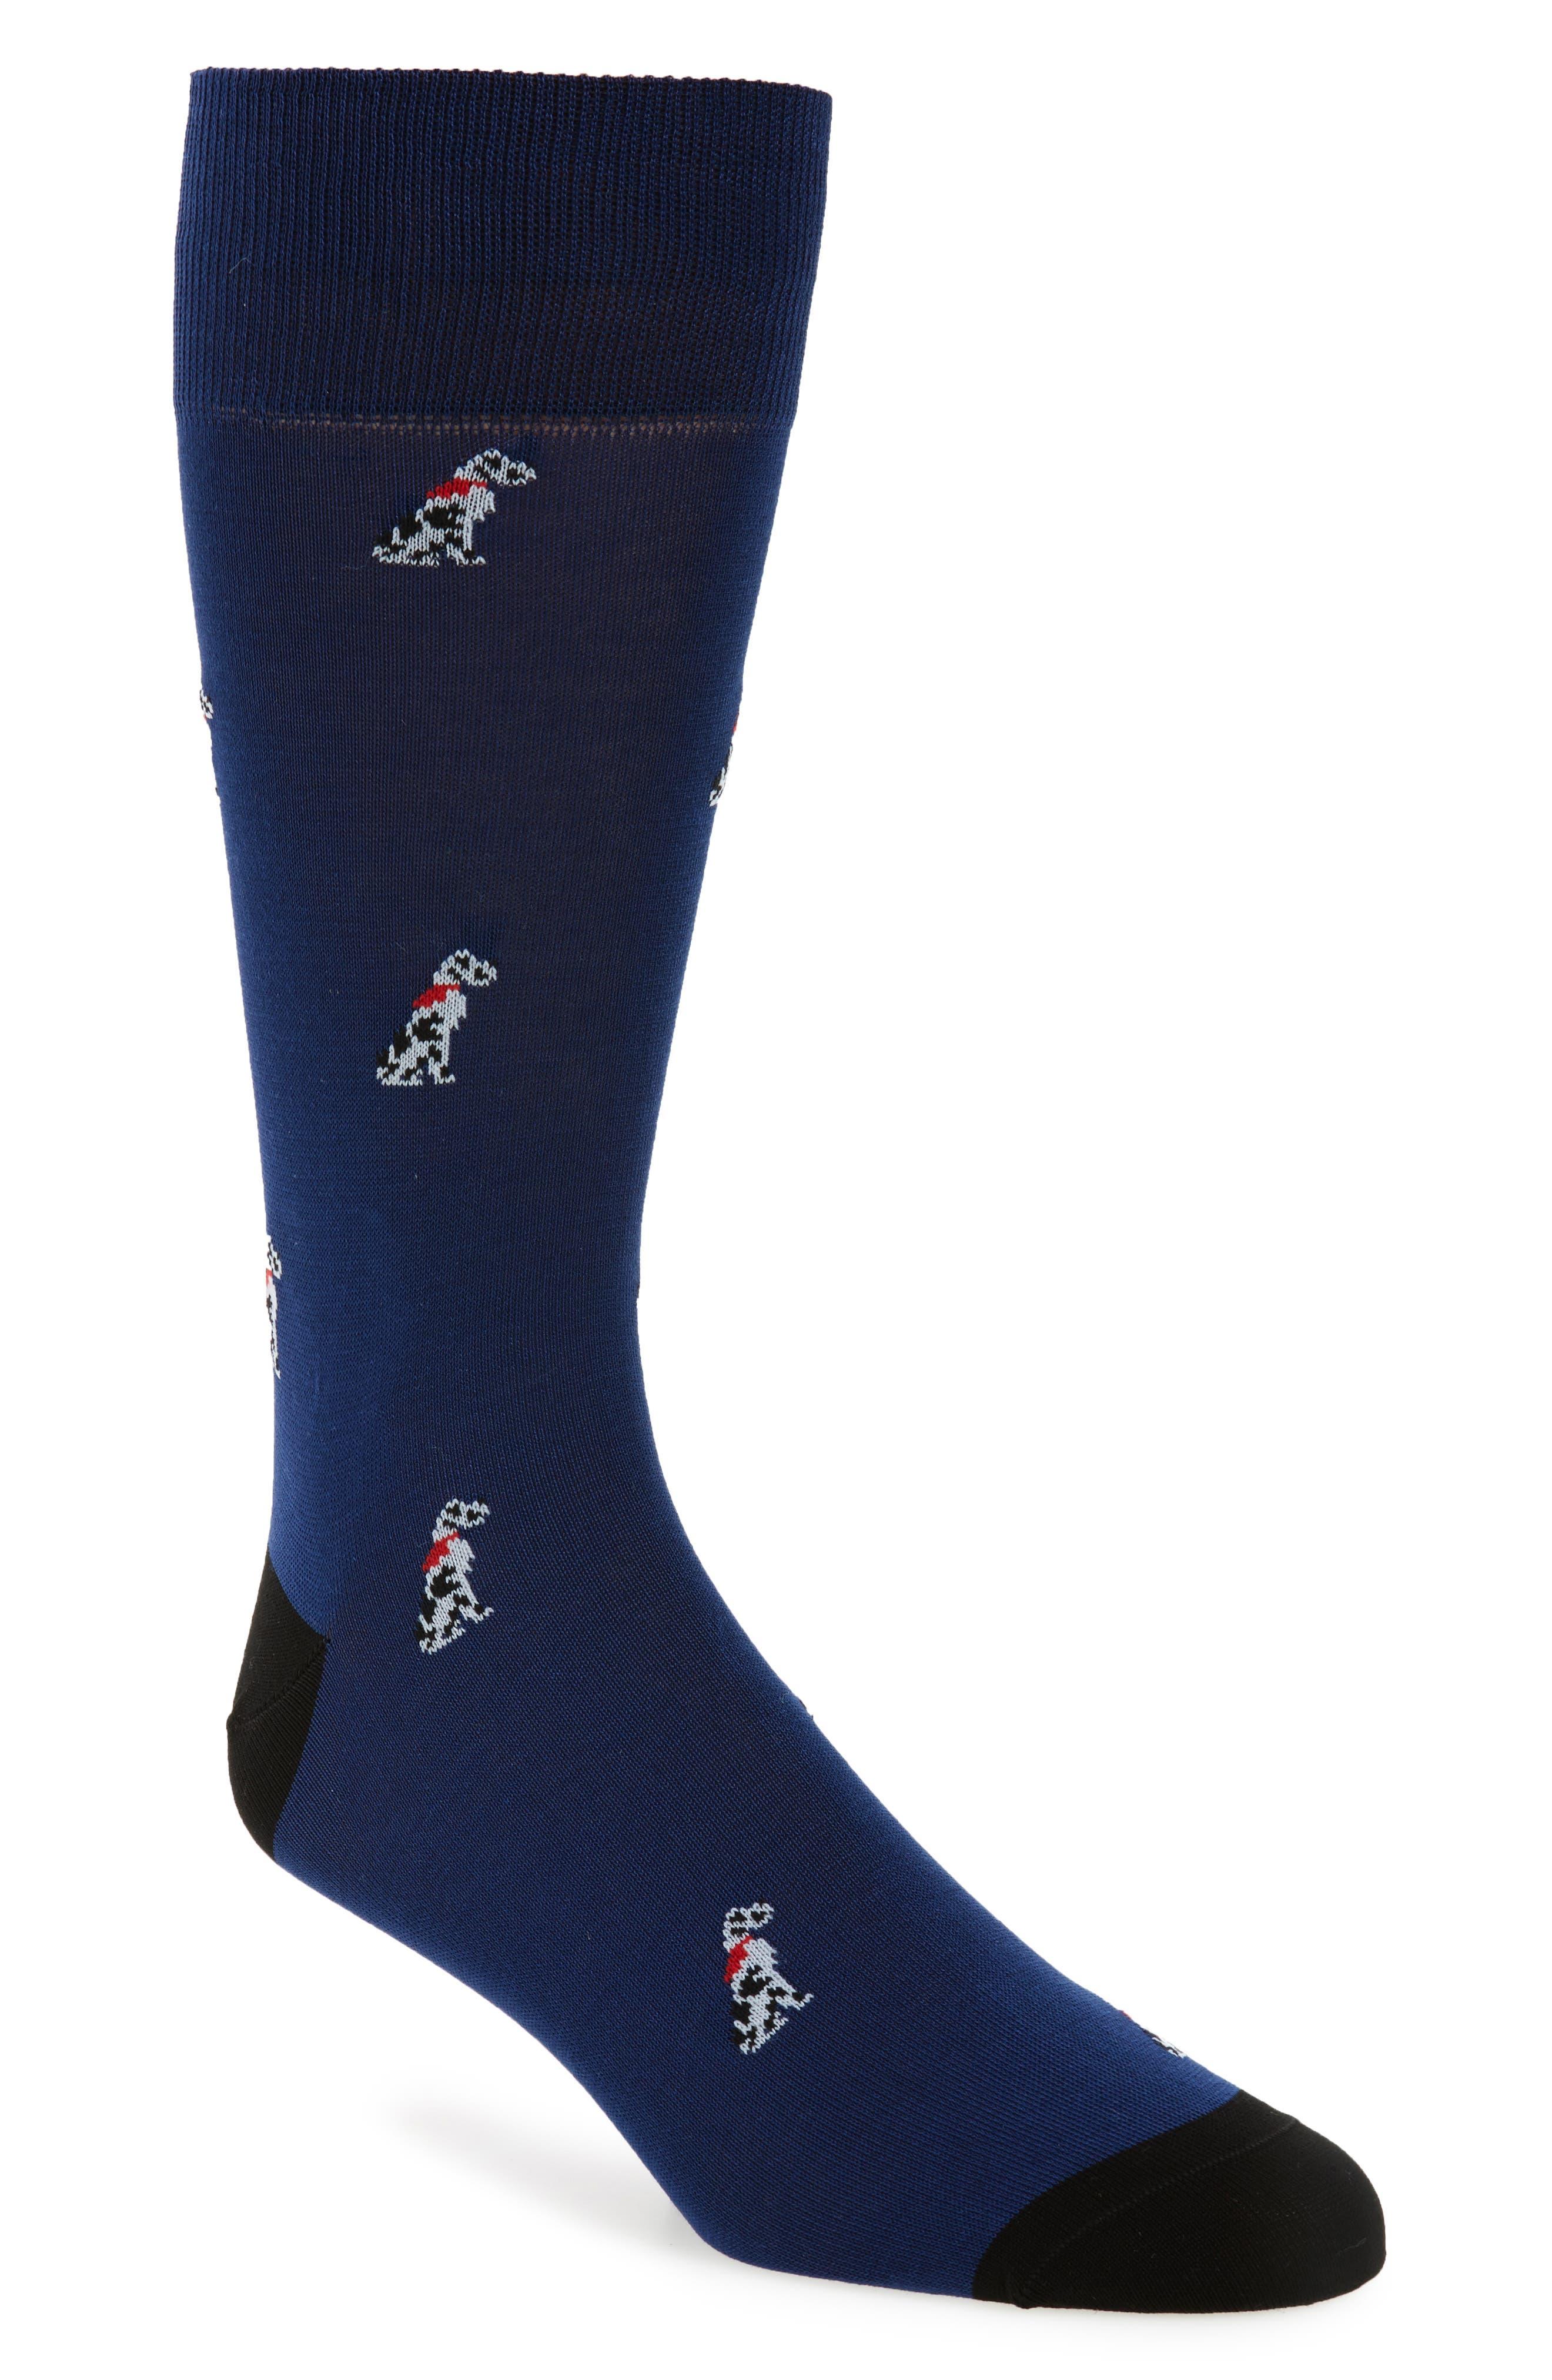 Main Image - Paul Smith Dog Socks